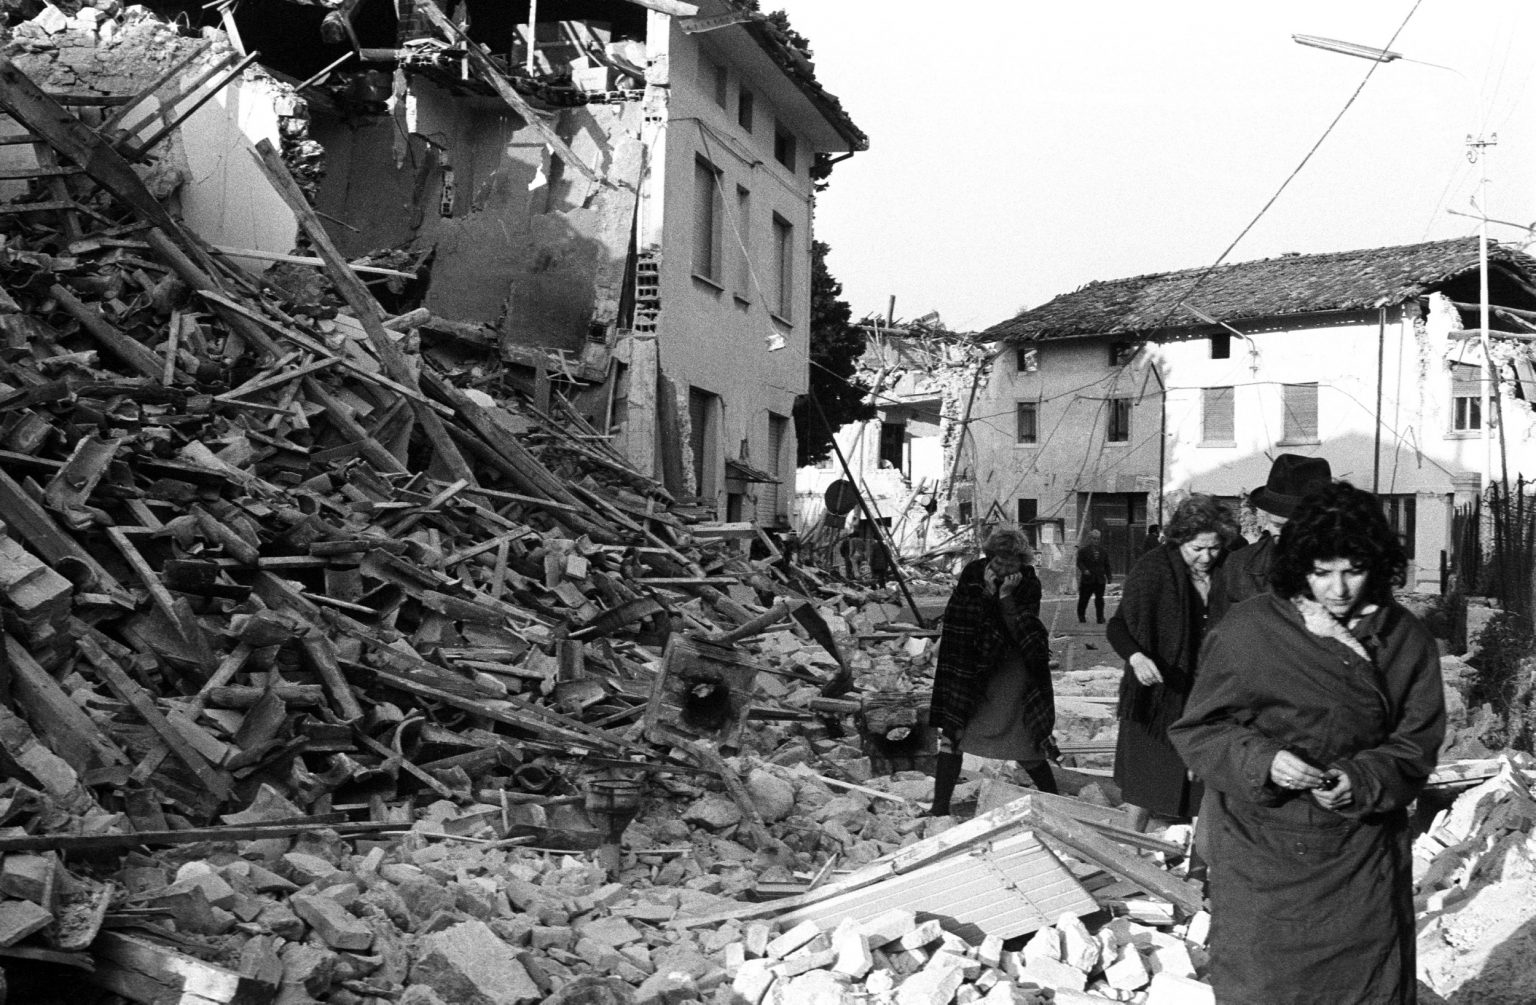 friuli-1976-earthquake-terremoto